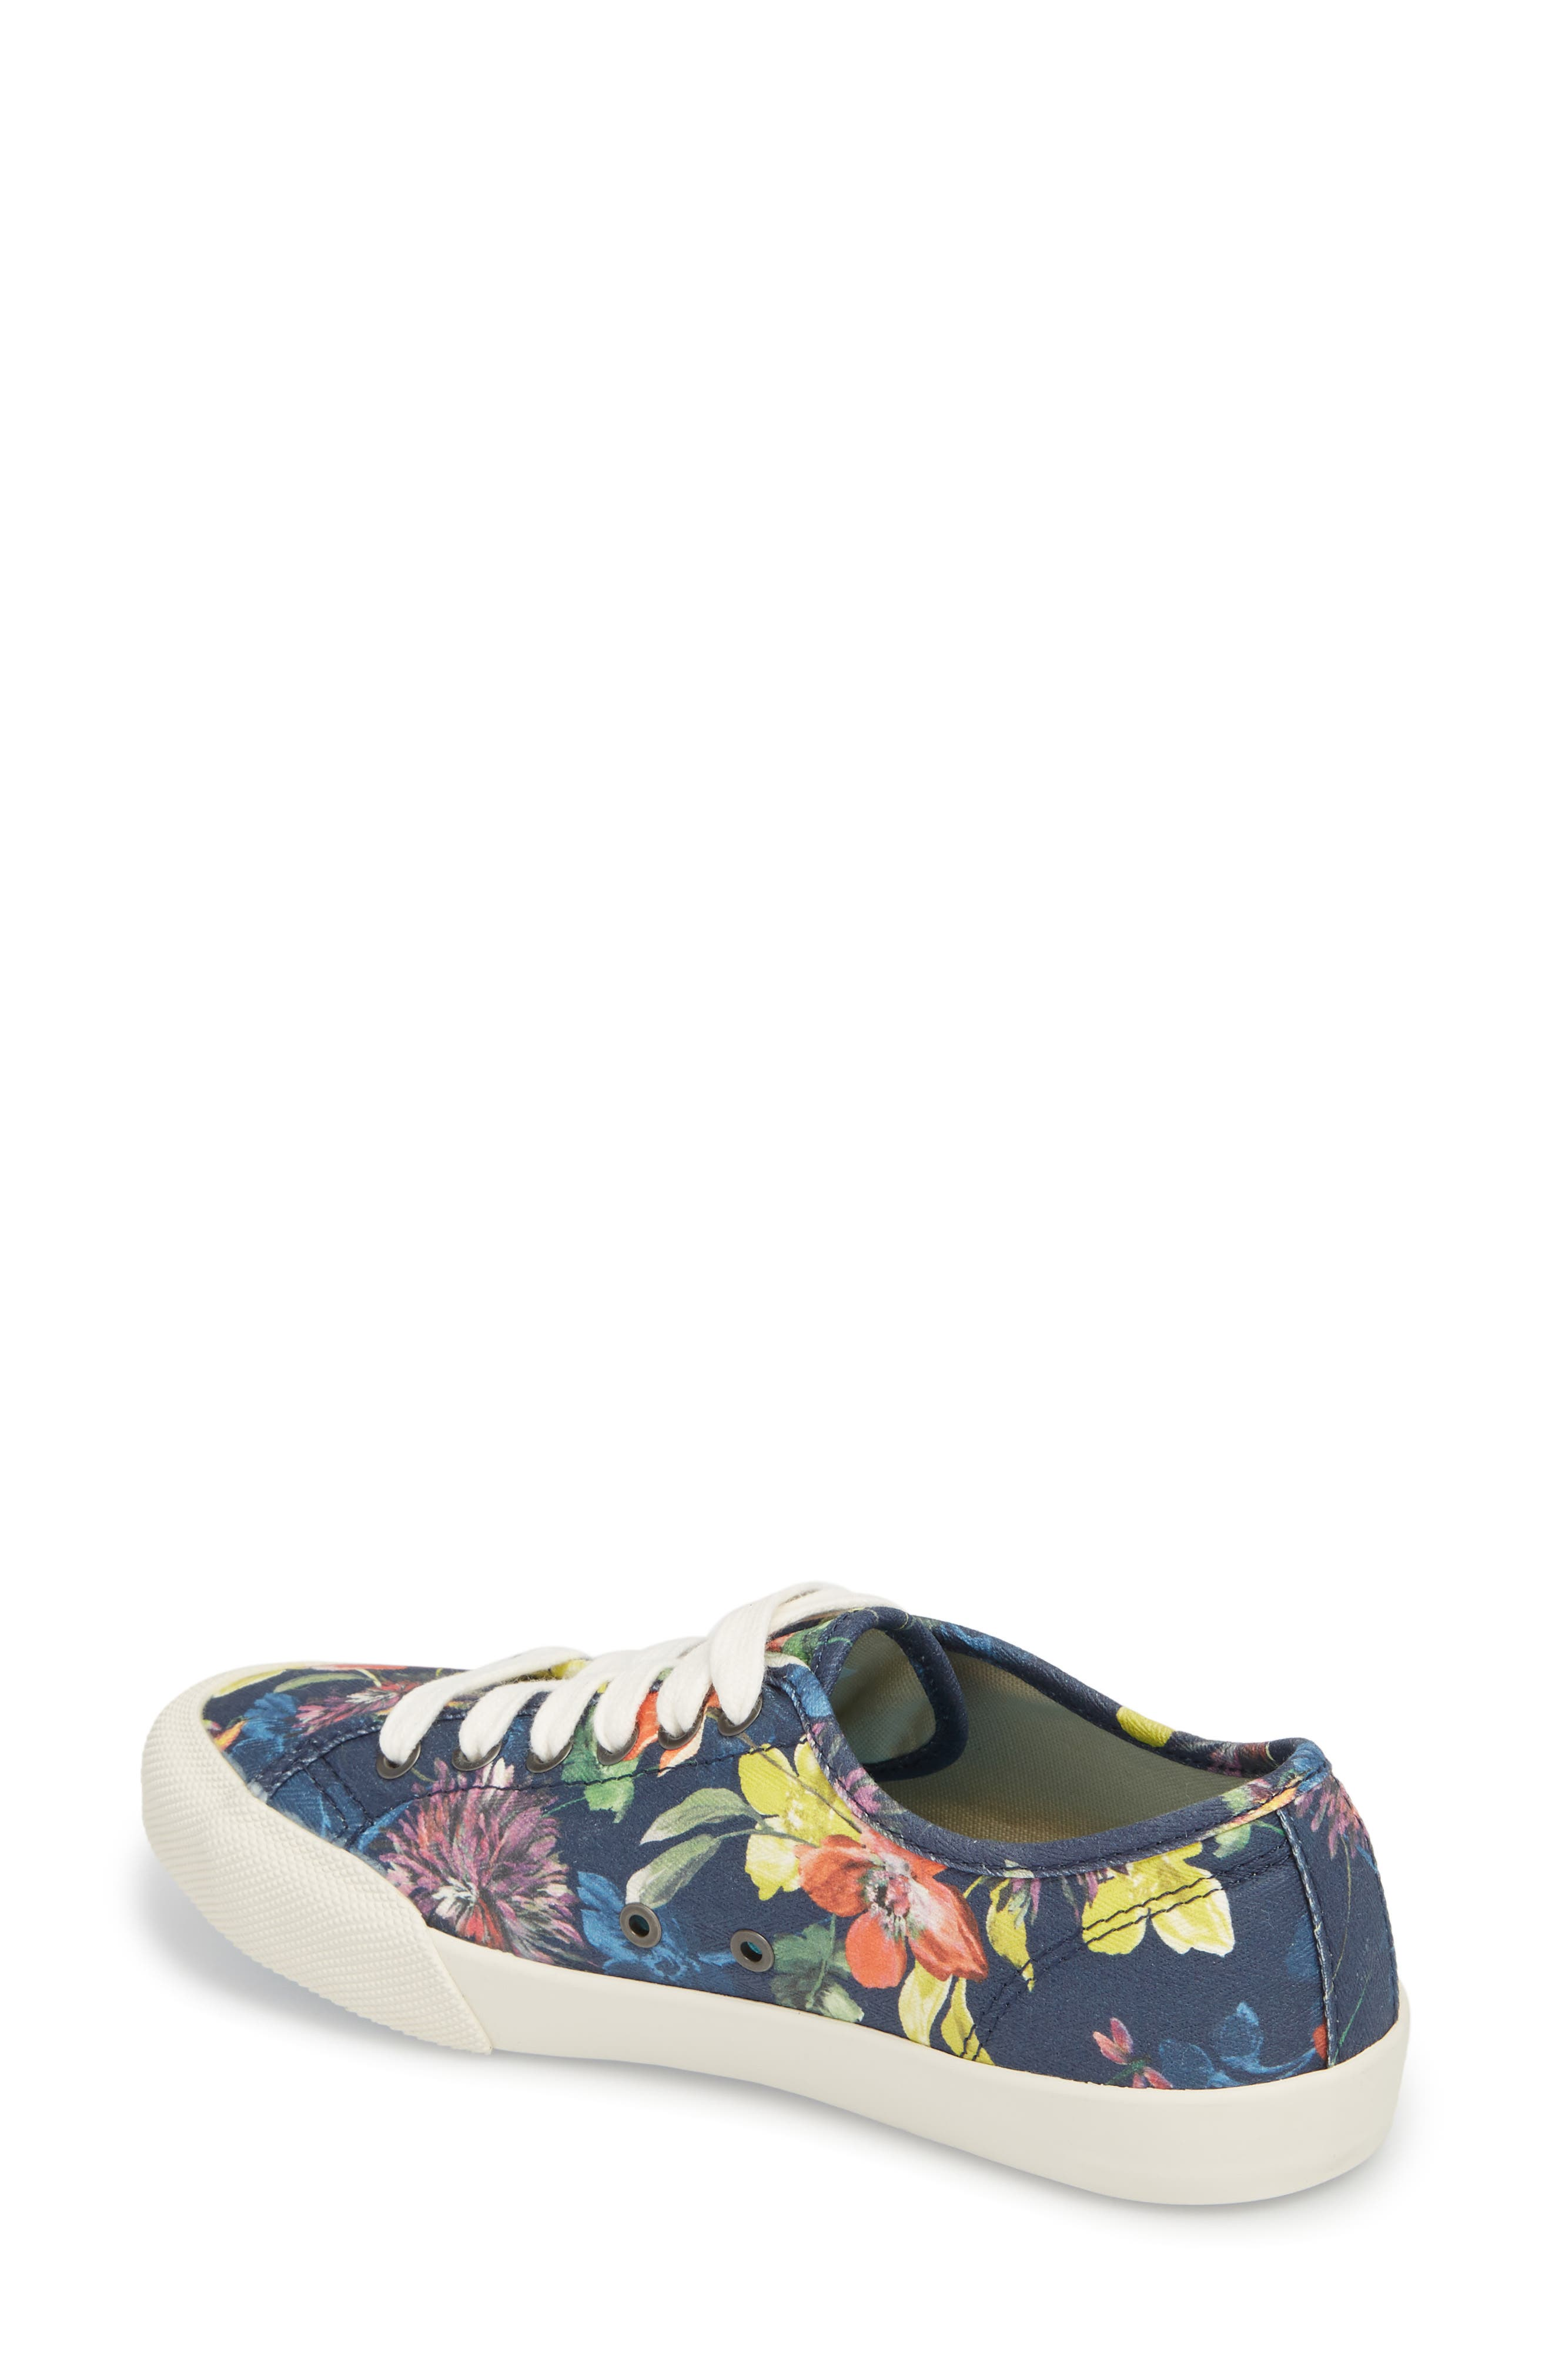 x Trina Turk Monterey Sneaker,                             Alternate thumbnail 2, color,                             Navy Chrysanthemum